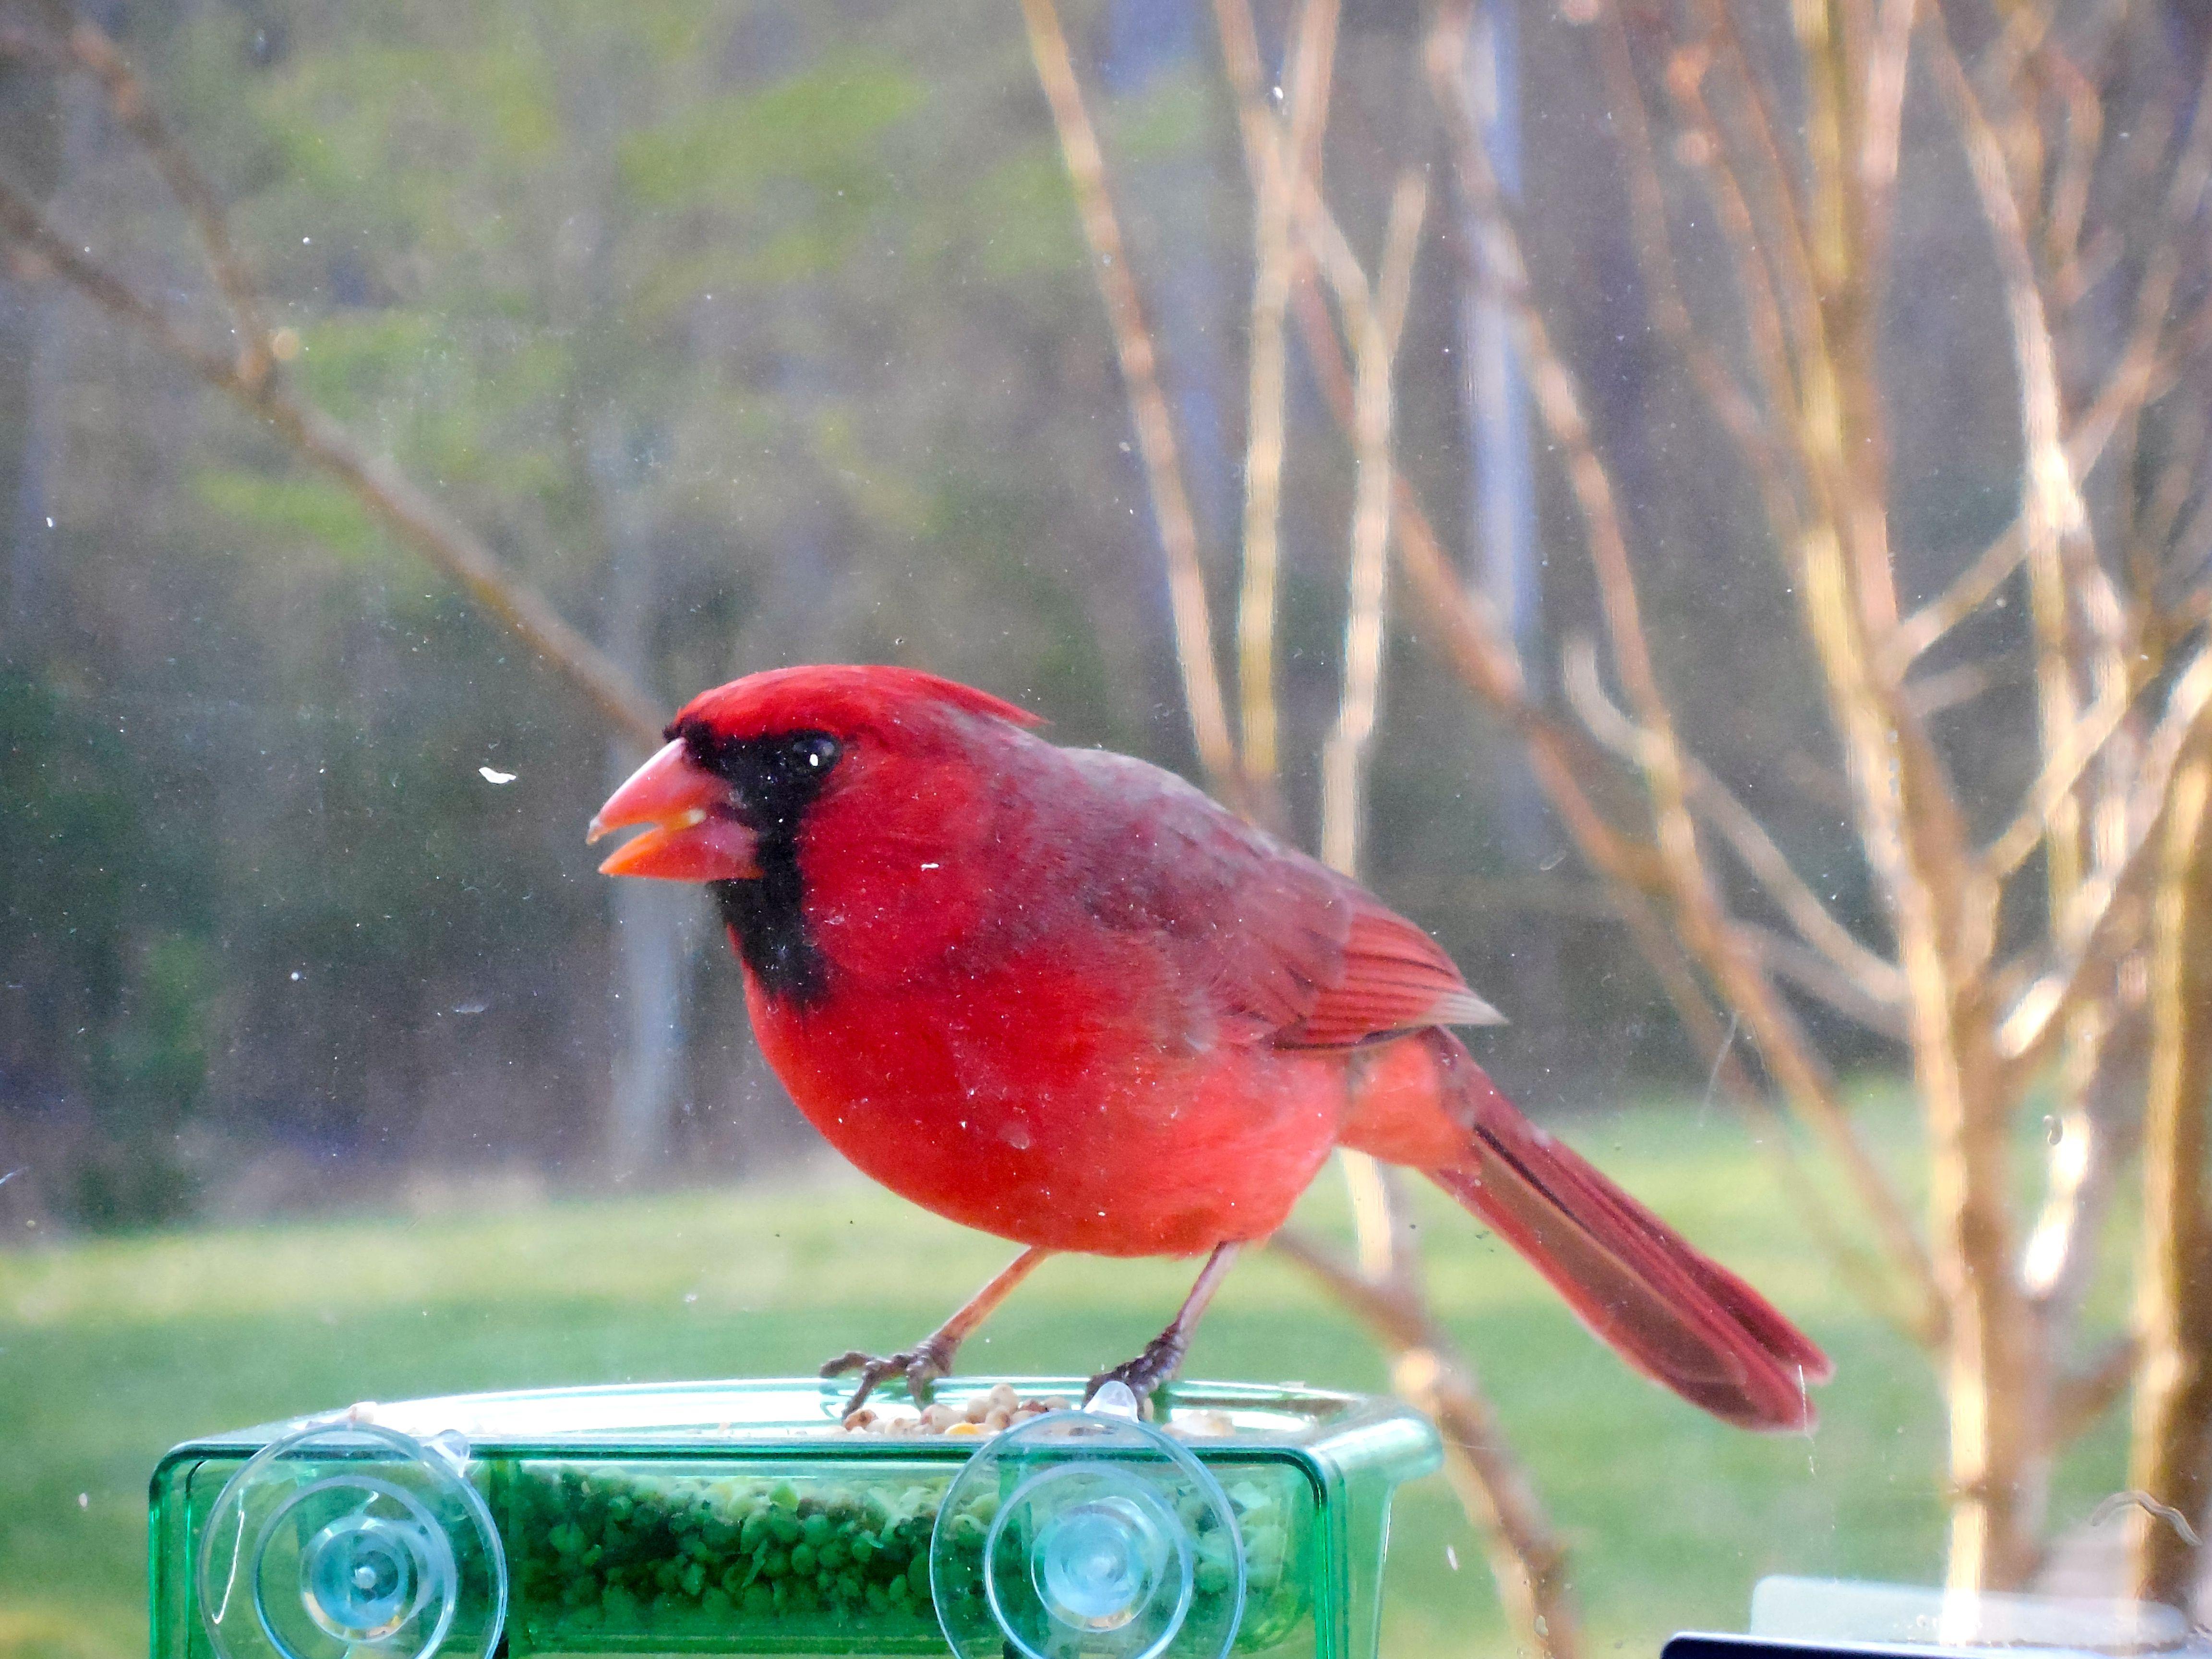 Backyard cardinal view from my home office animals birds